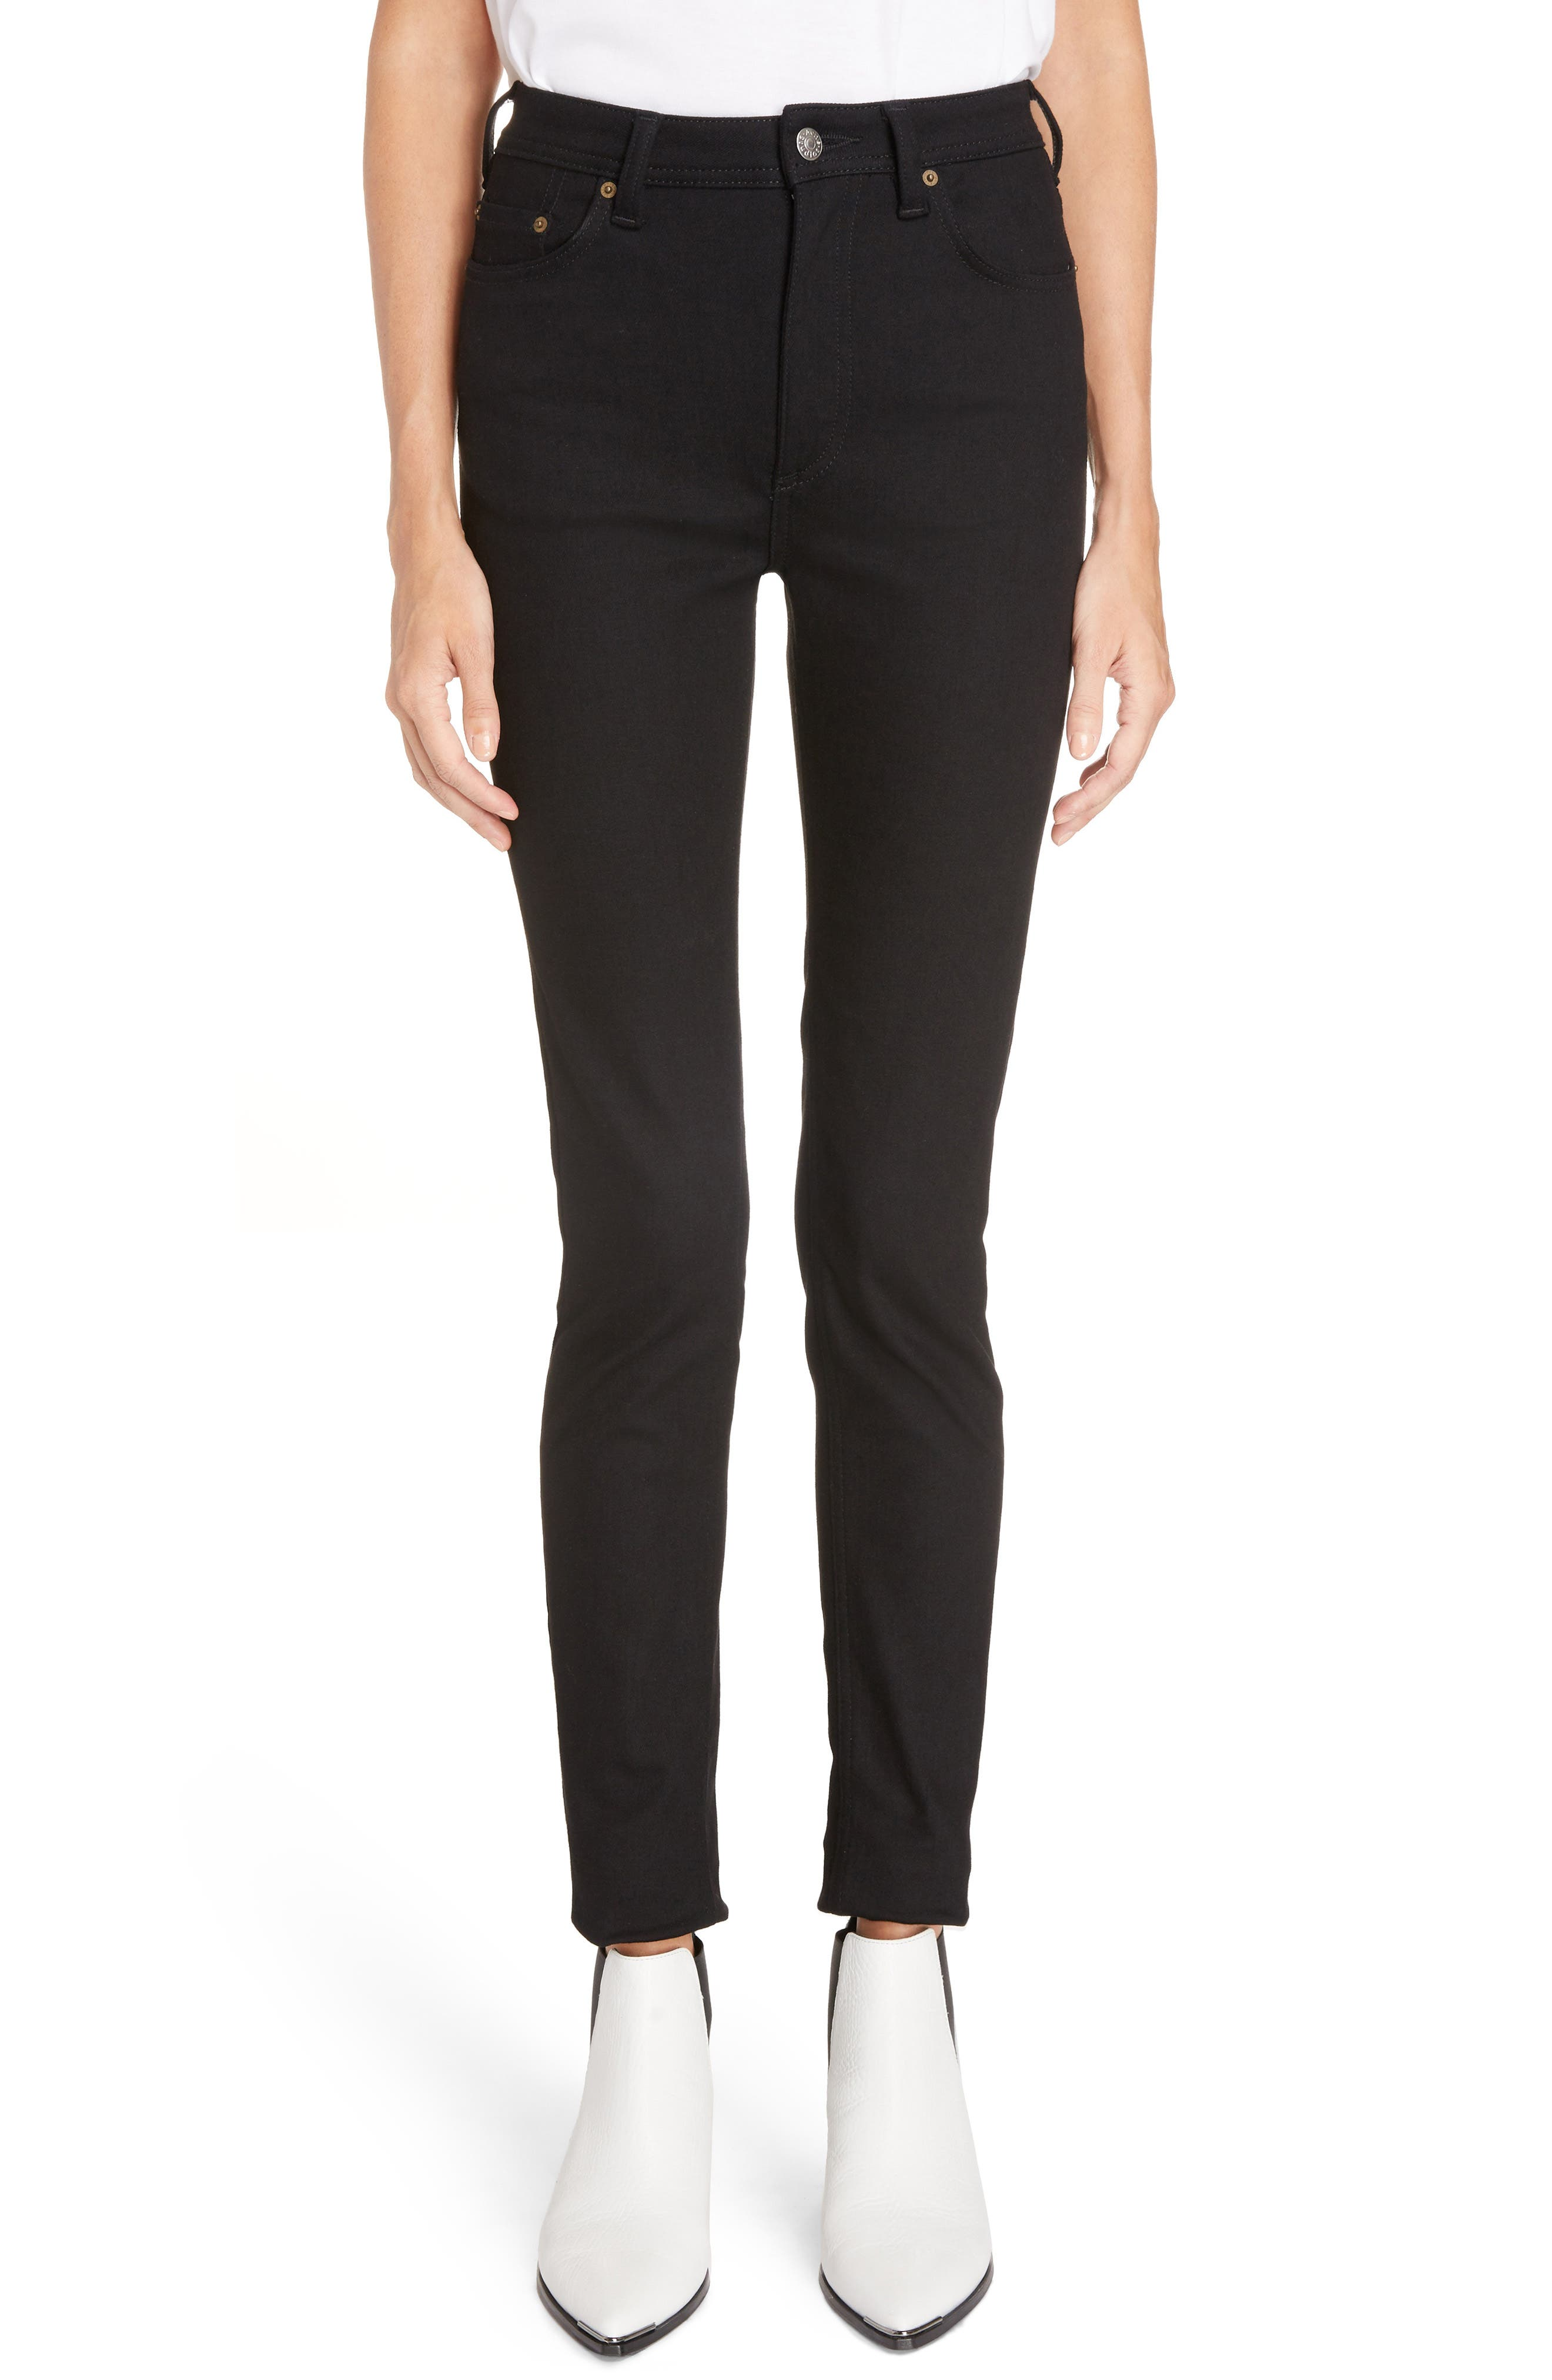 Peg High Waist Skinny Jeans,                             Main thumbnail 1, color,                             BLACK